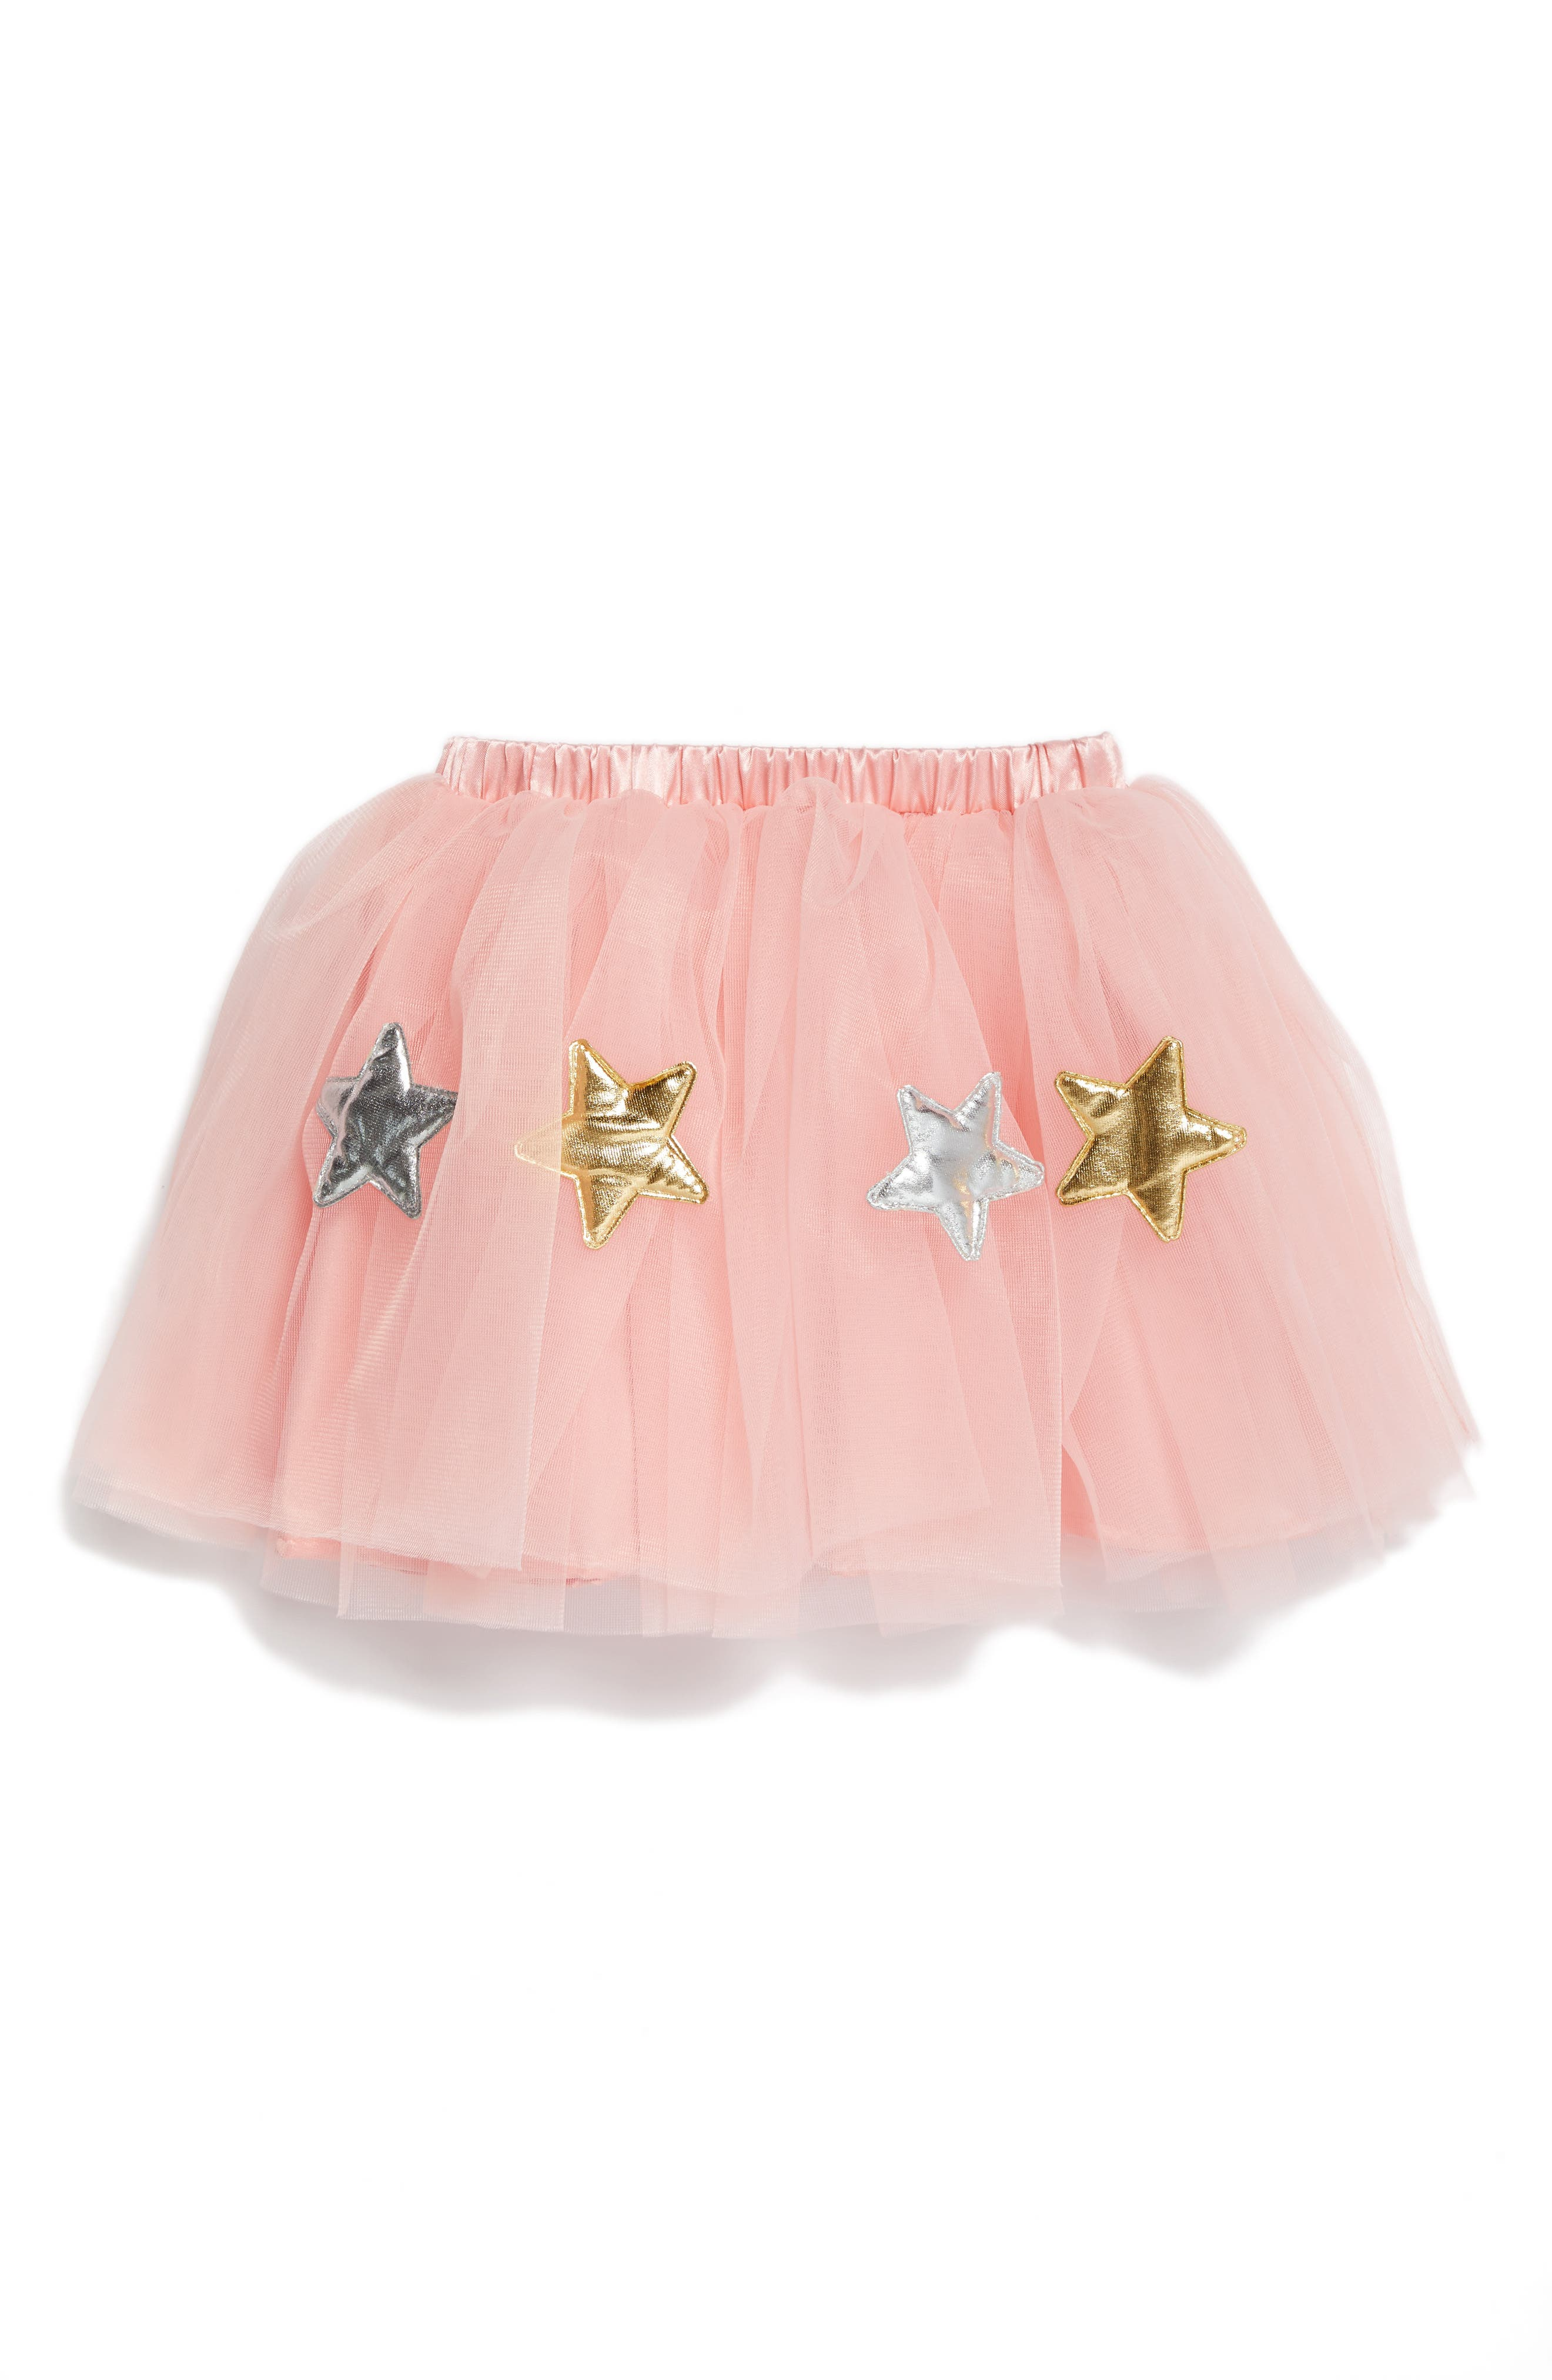 Main Image - Popatu Star Appliqué Tutu Skirt (Toddler Girls & Little Girls)